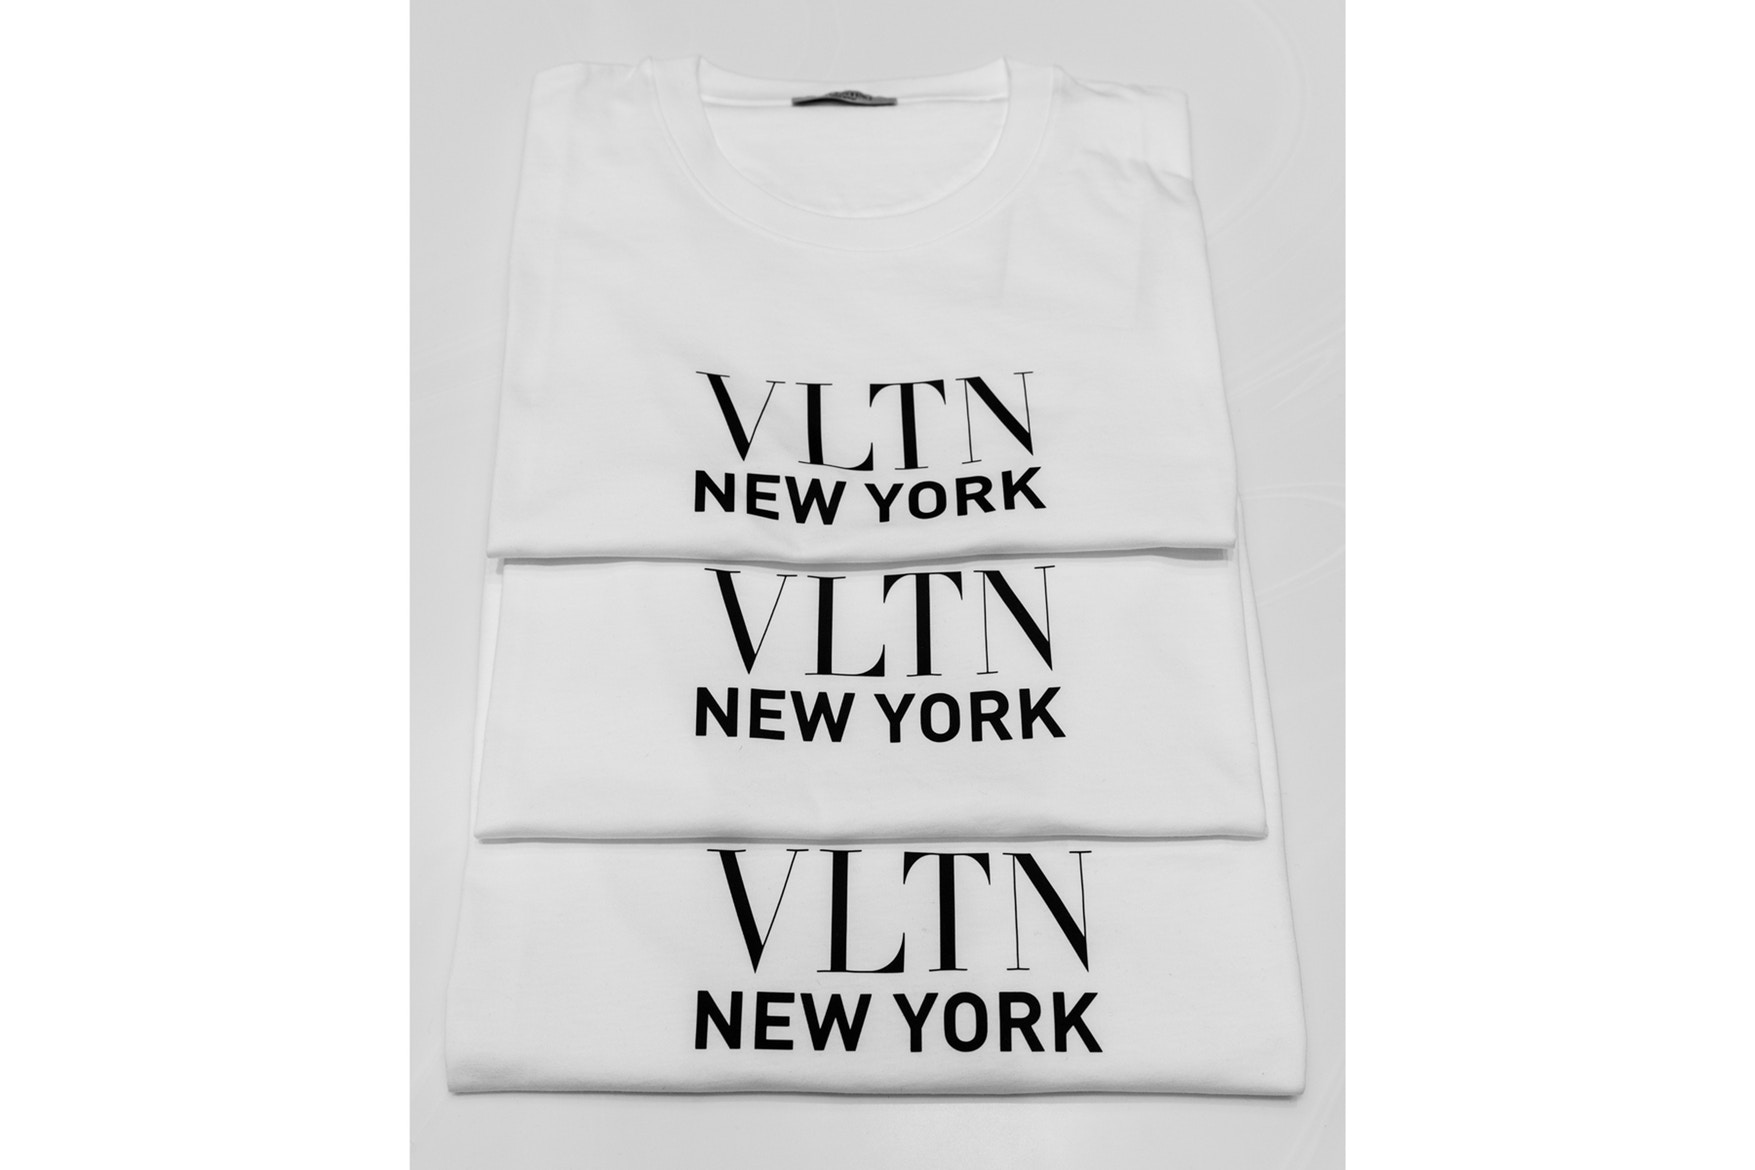 valentino-vltn-new-york-pop-up-mens-collection-25.jpg